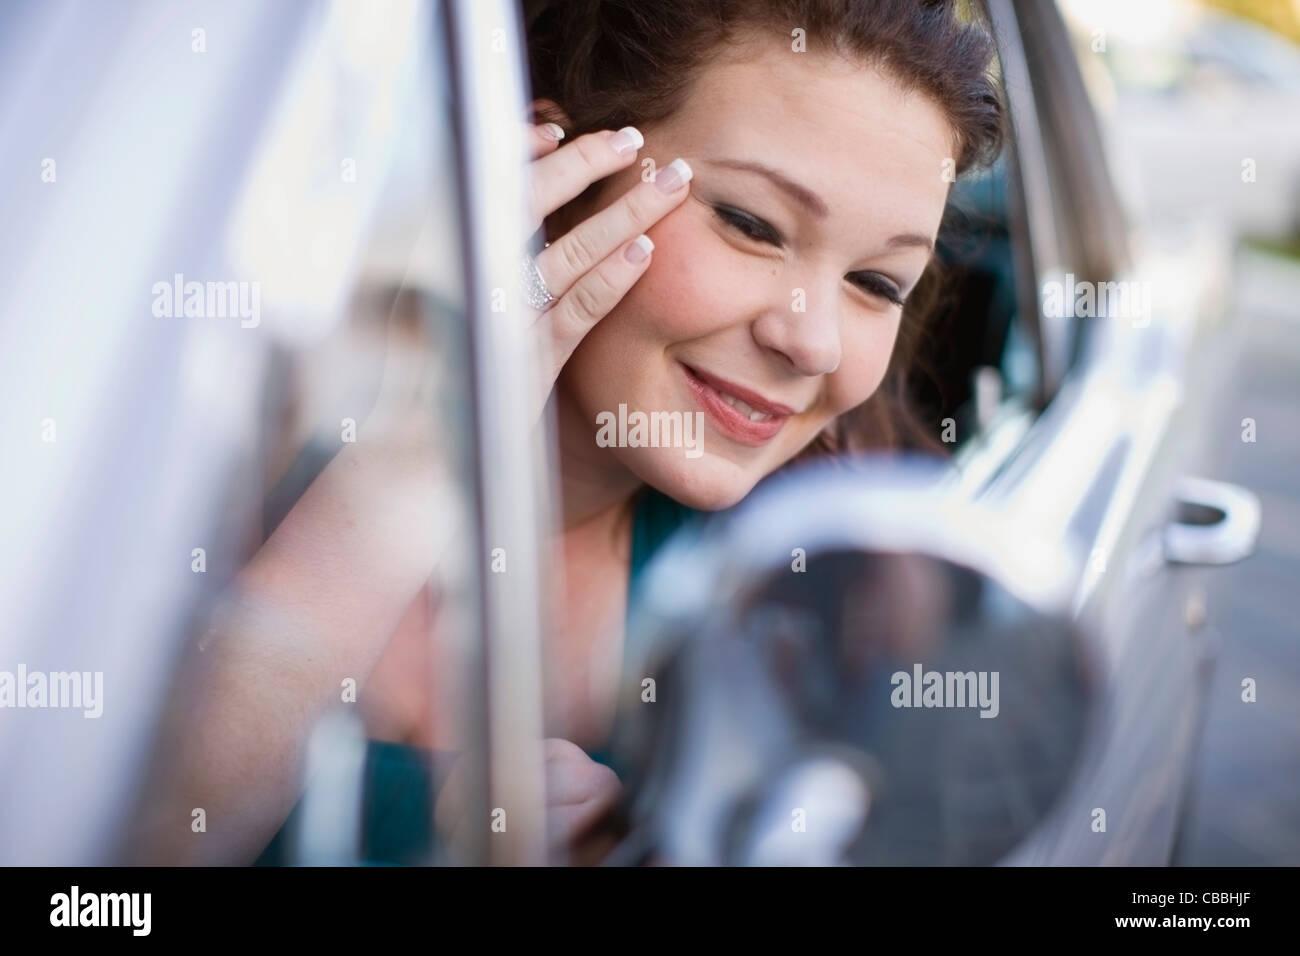 Teenager-Mädchen Make-up im Auto prüfen Stockbild